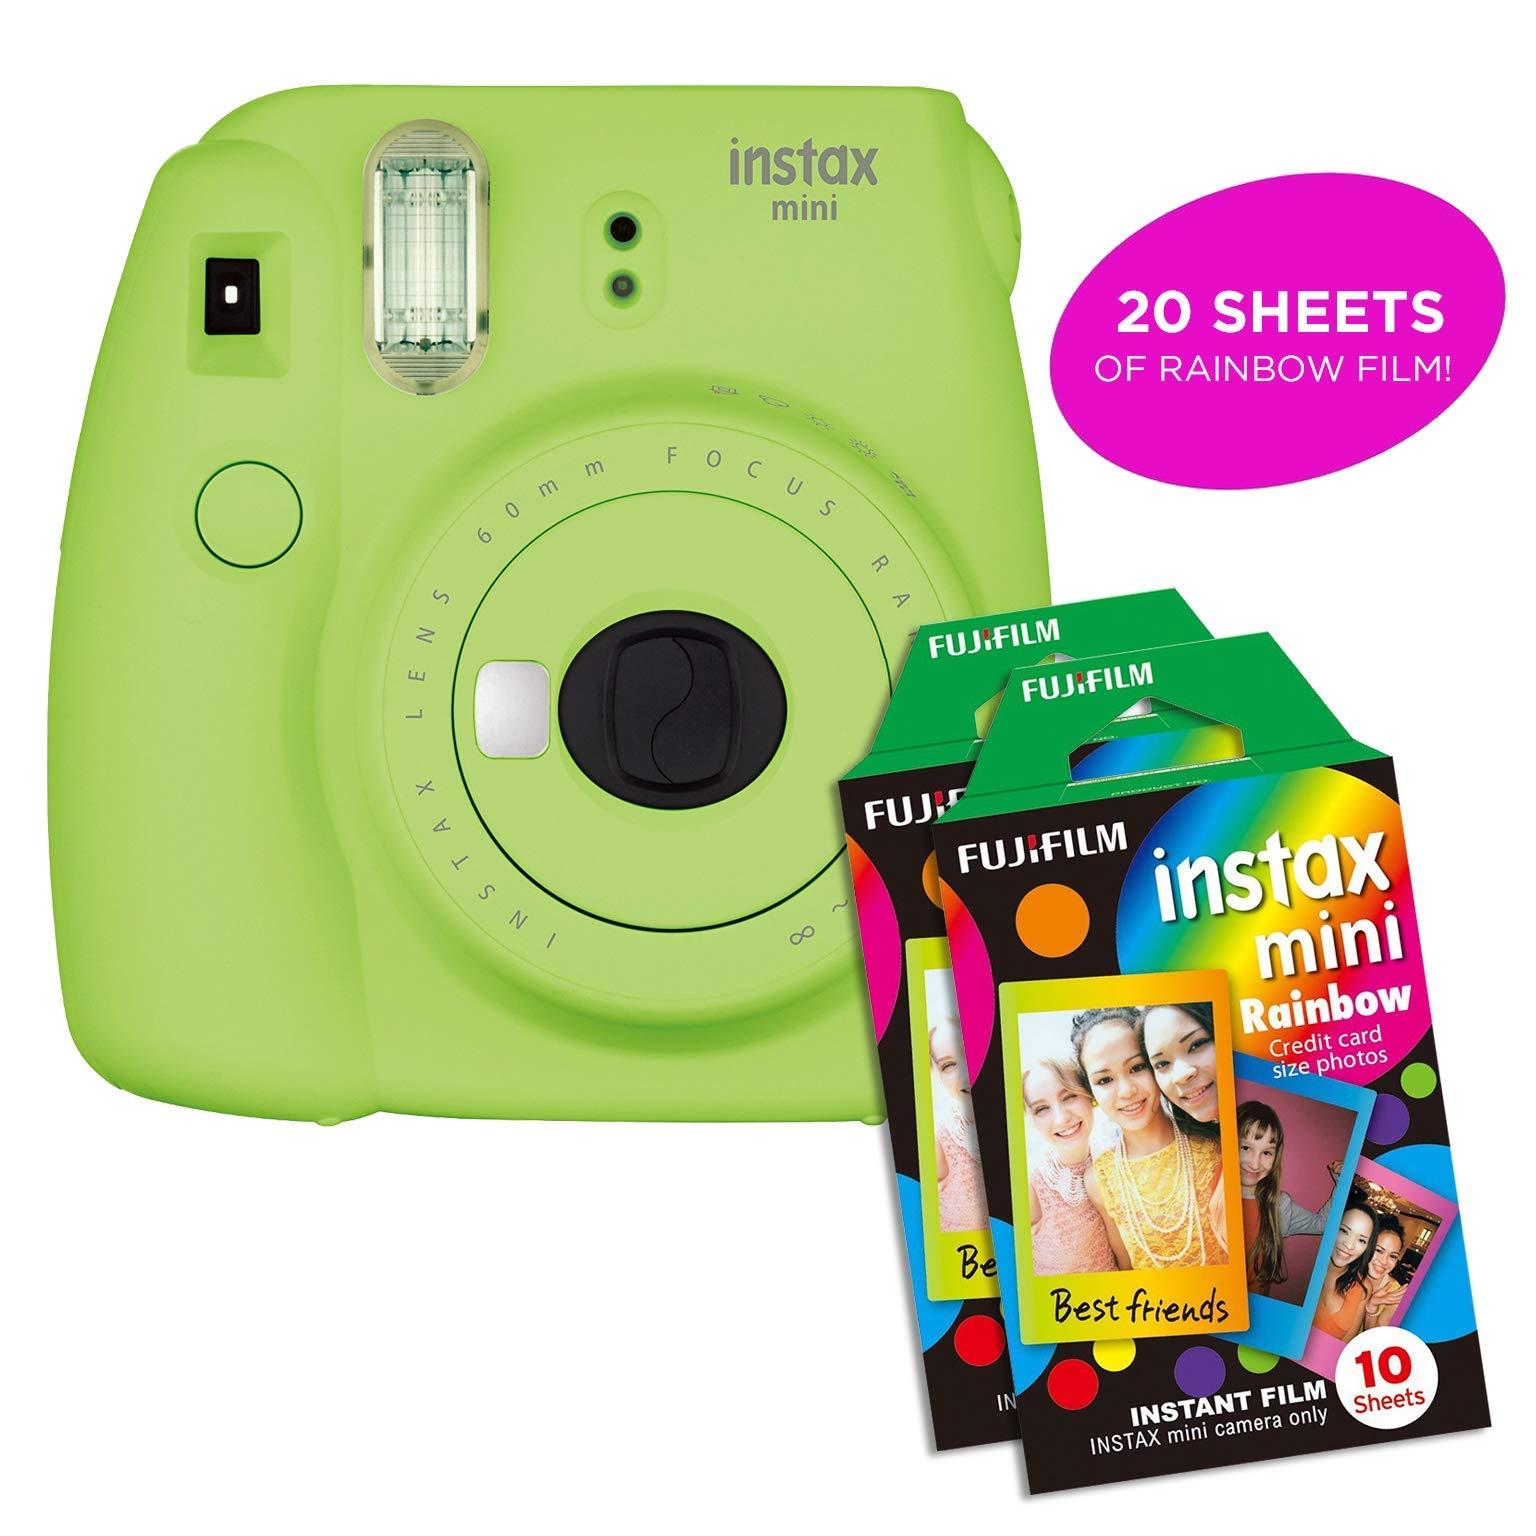 Fujifilm Instax Mini 9 Instant Camera Includes 2 Rainbow Film Packs (20 Photo Sheets Total) | Selfie Mirror, Auto Lens & Light Exposure Setting (Lime Green) by Fujifilm